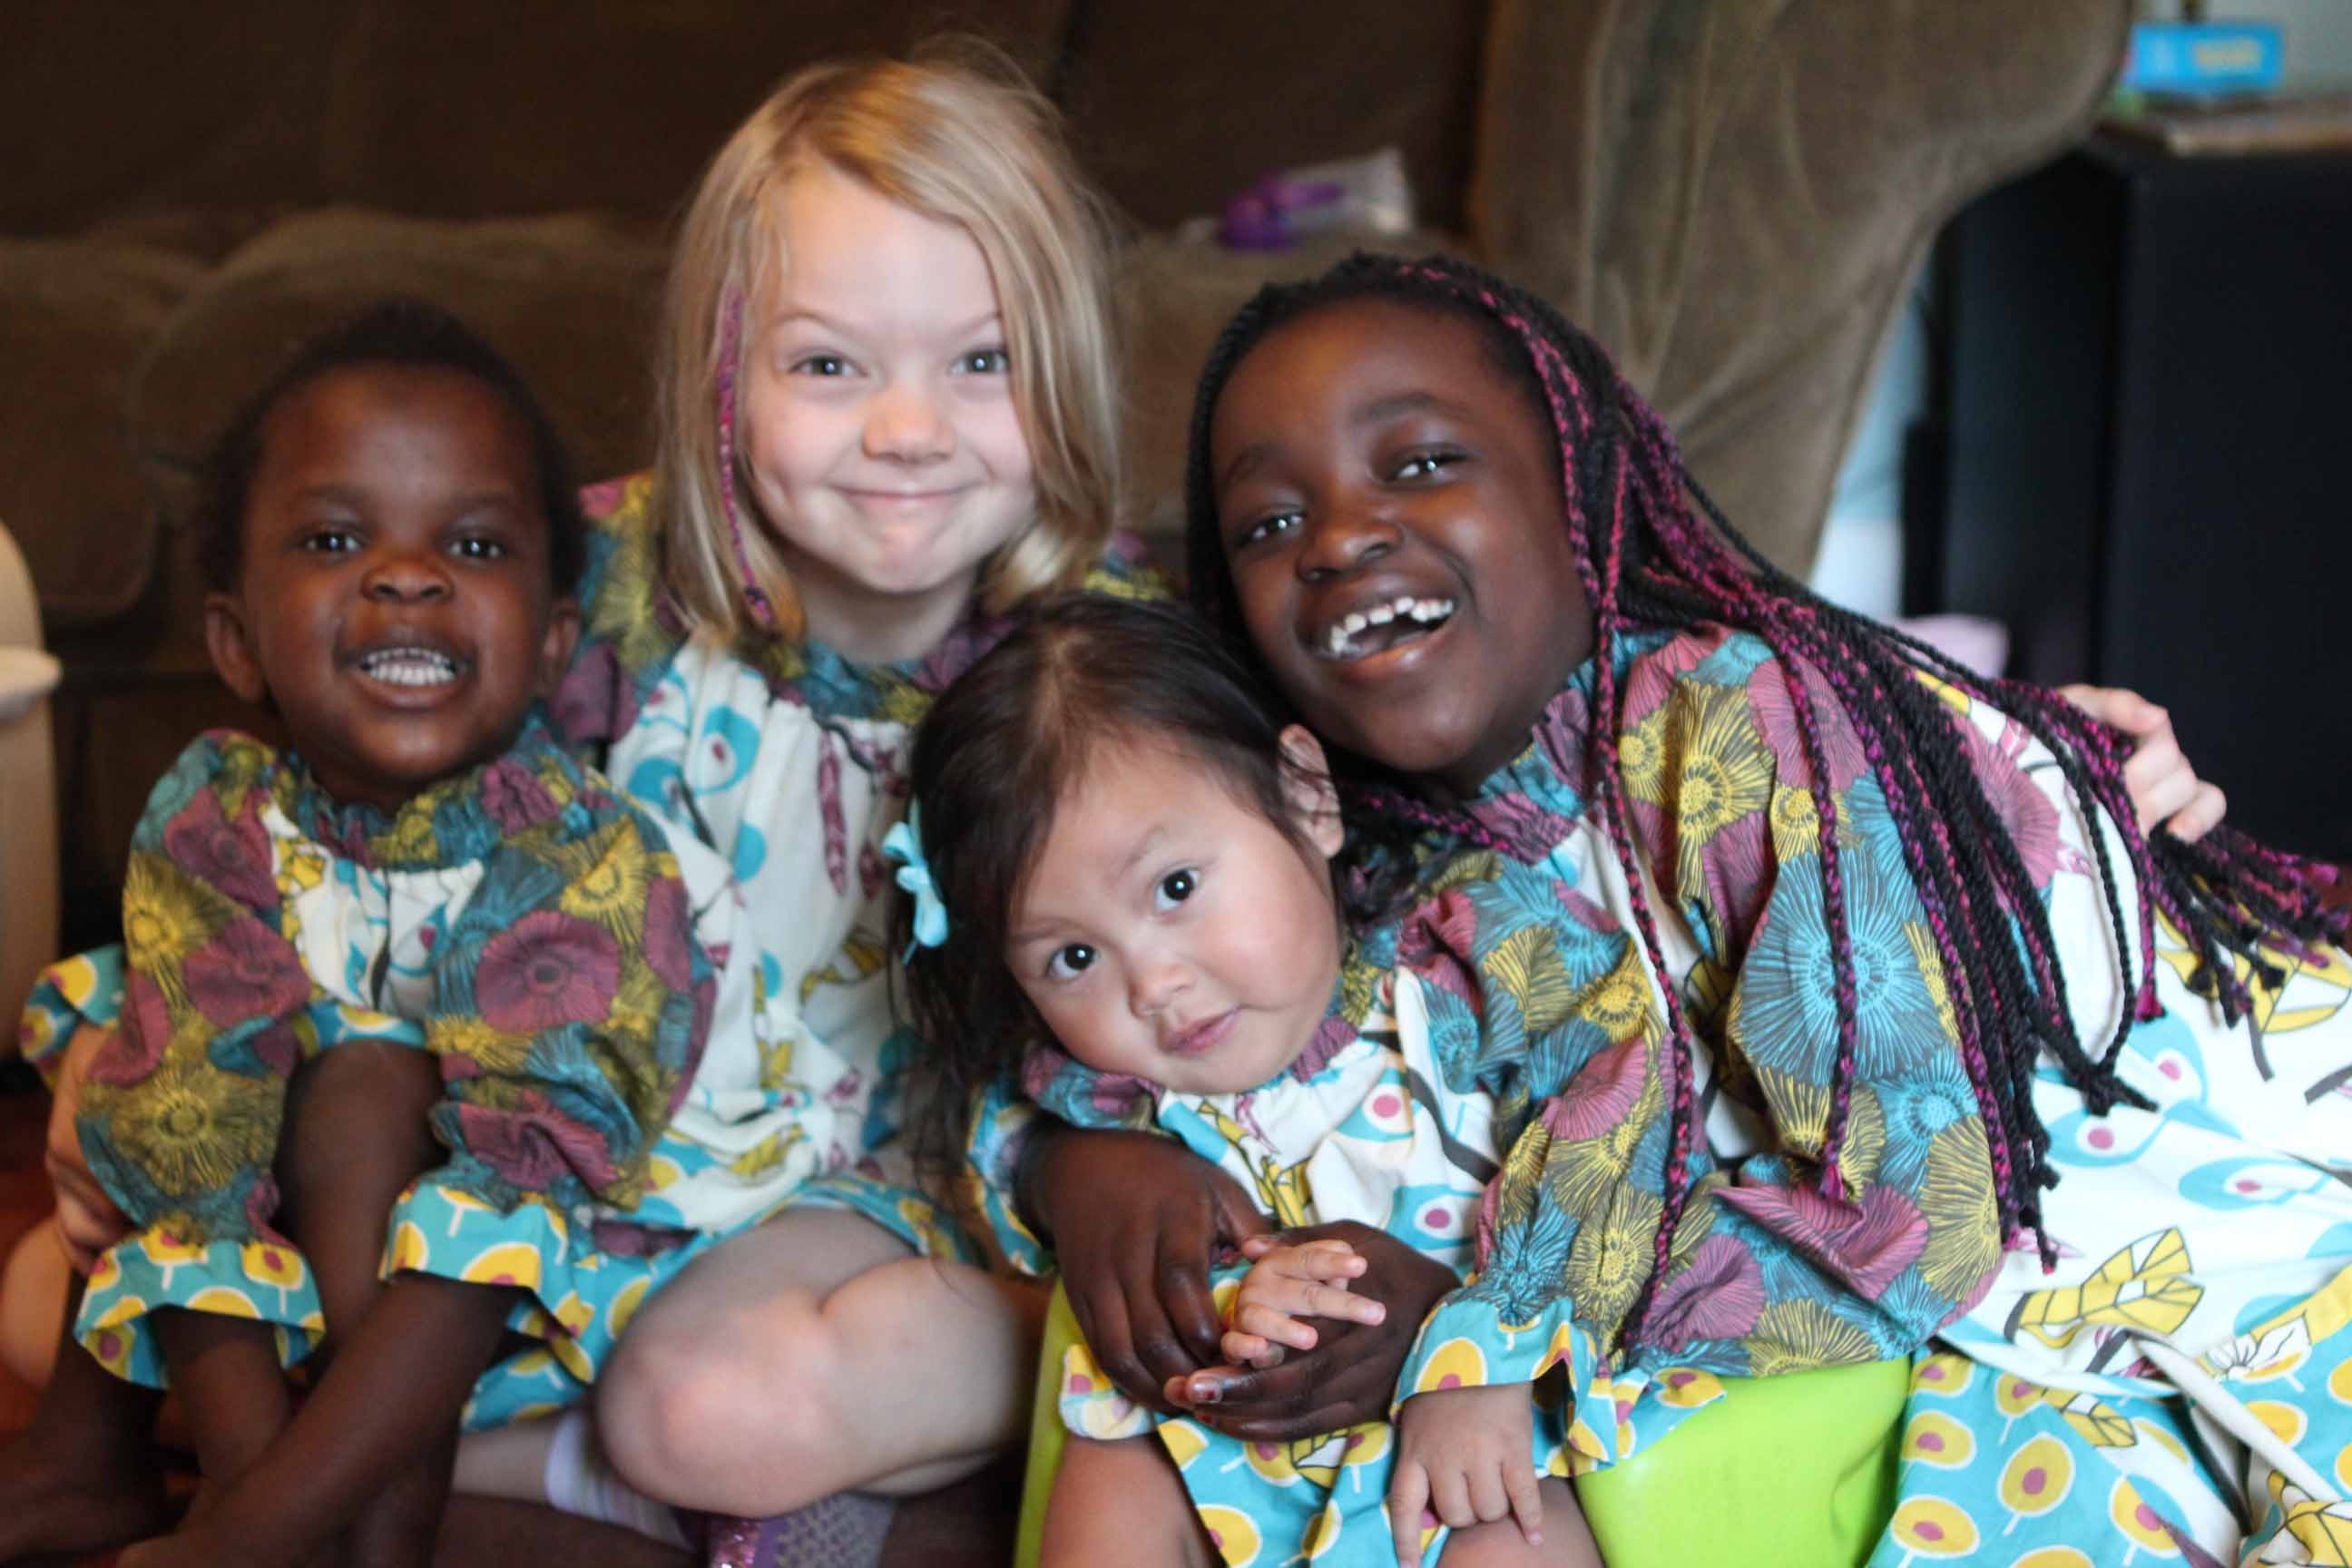 I do not like other peoples children, Im not nomalic